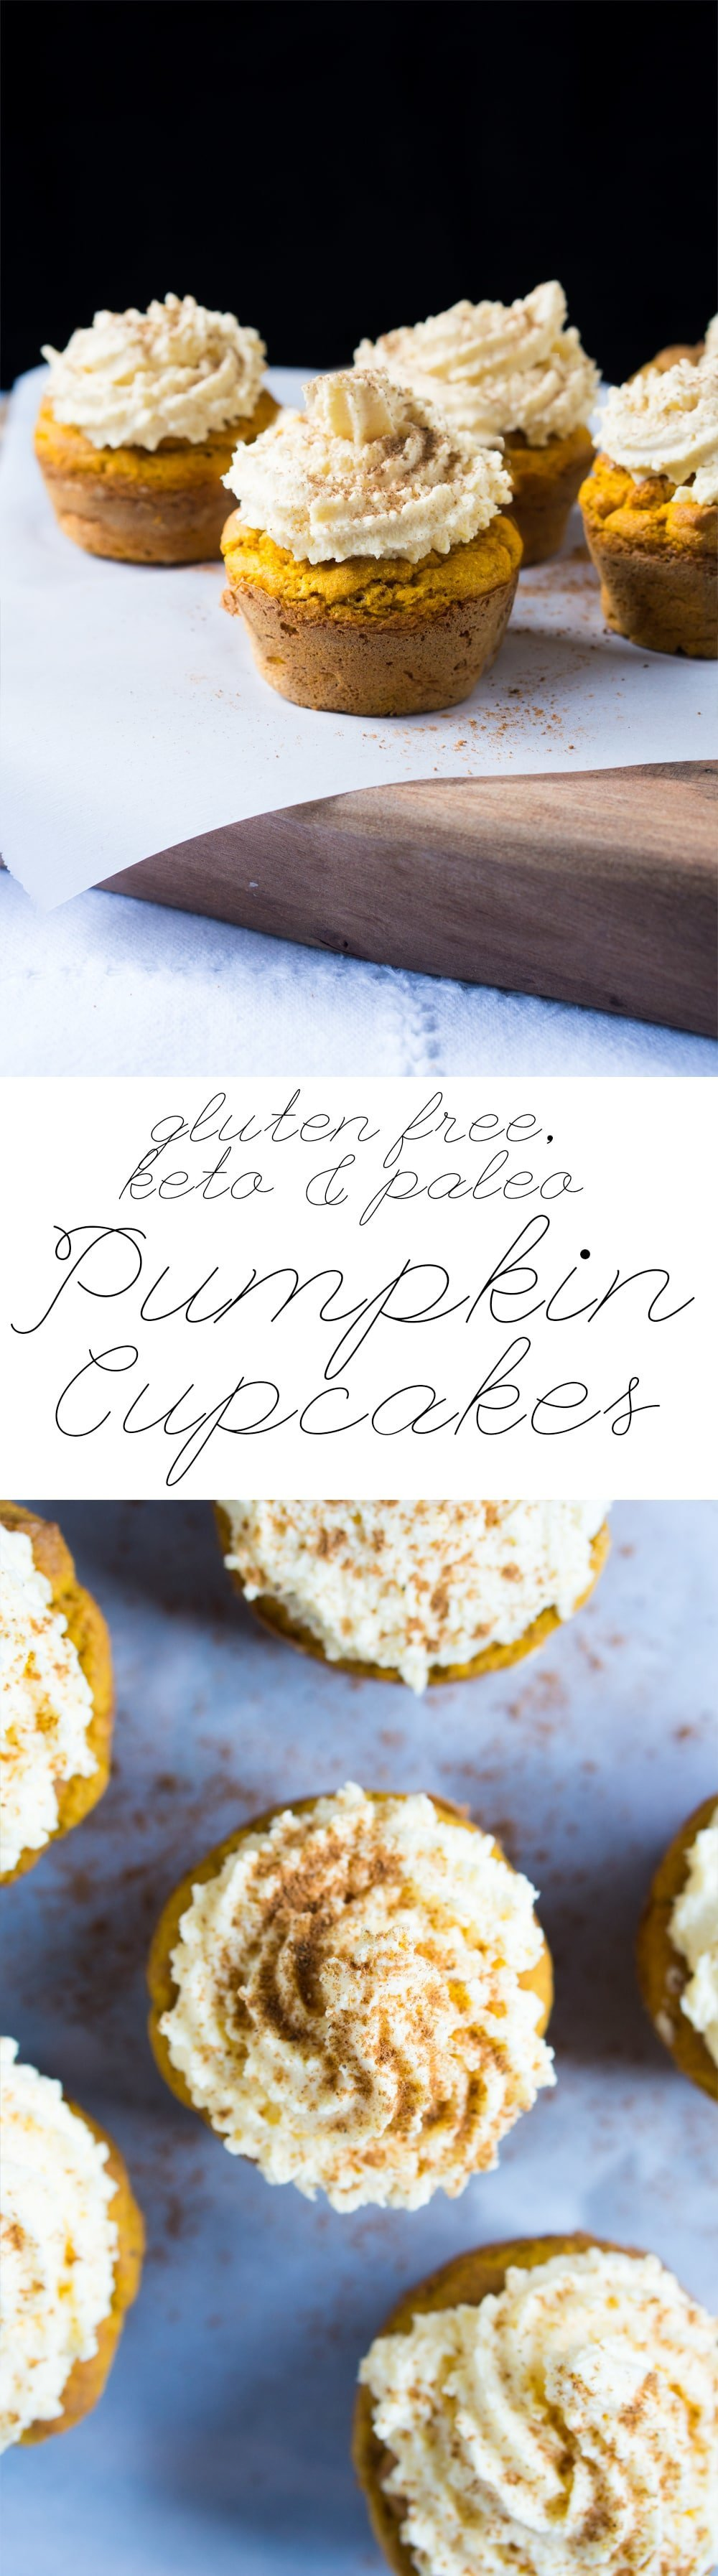 Gluten Free, Paleo & Keto Pumpkin Cupcakes 🎃